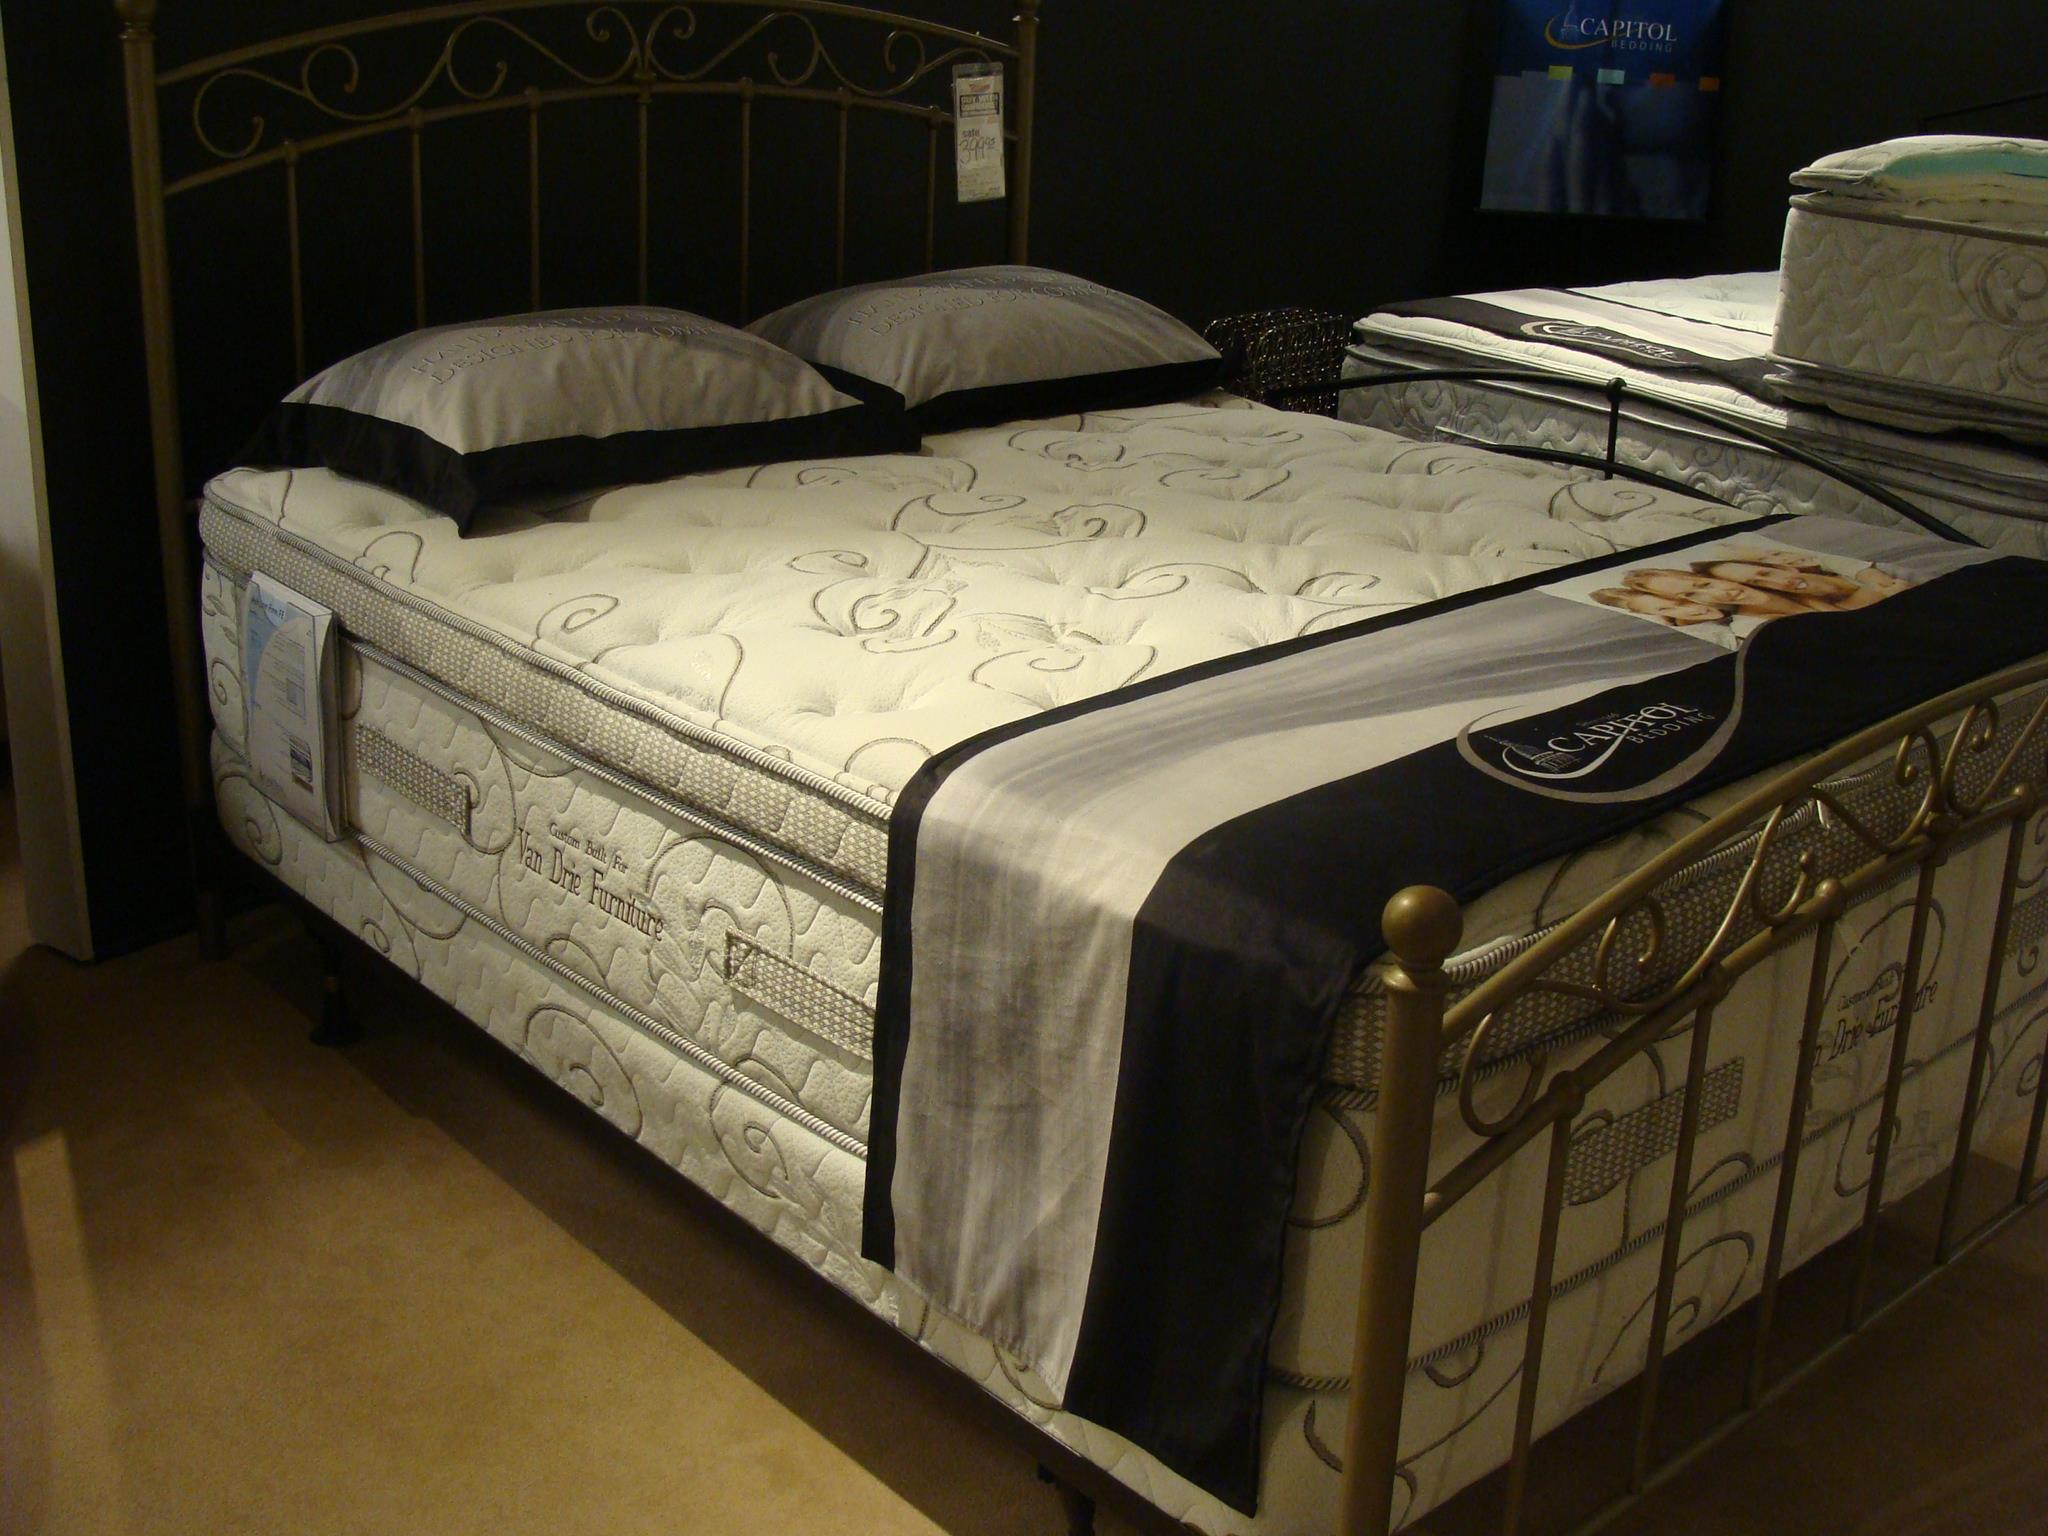 Capitol Bedding Grandeur Queen Firm Mattress Only - Item Number: Firm-Q